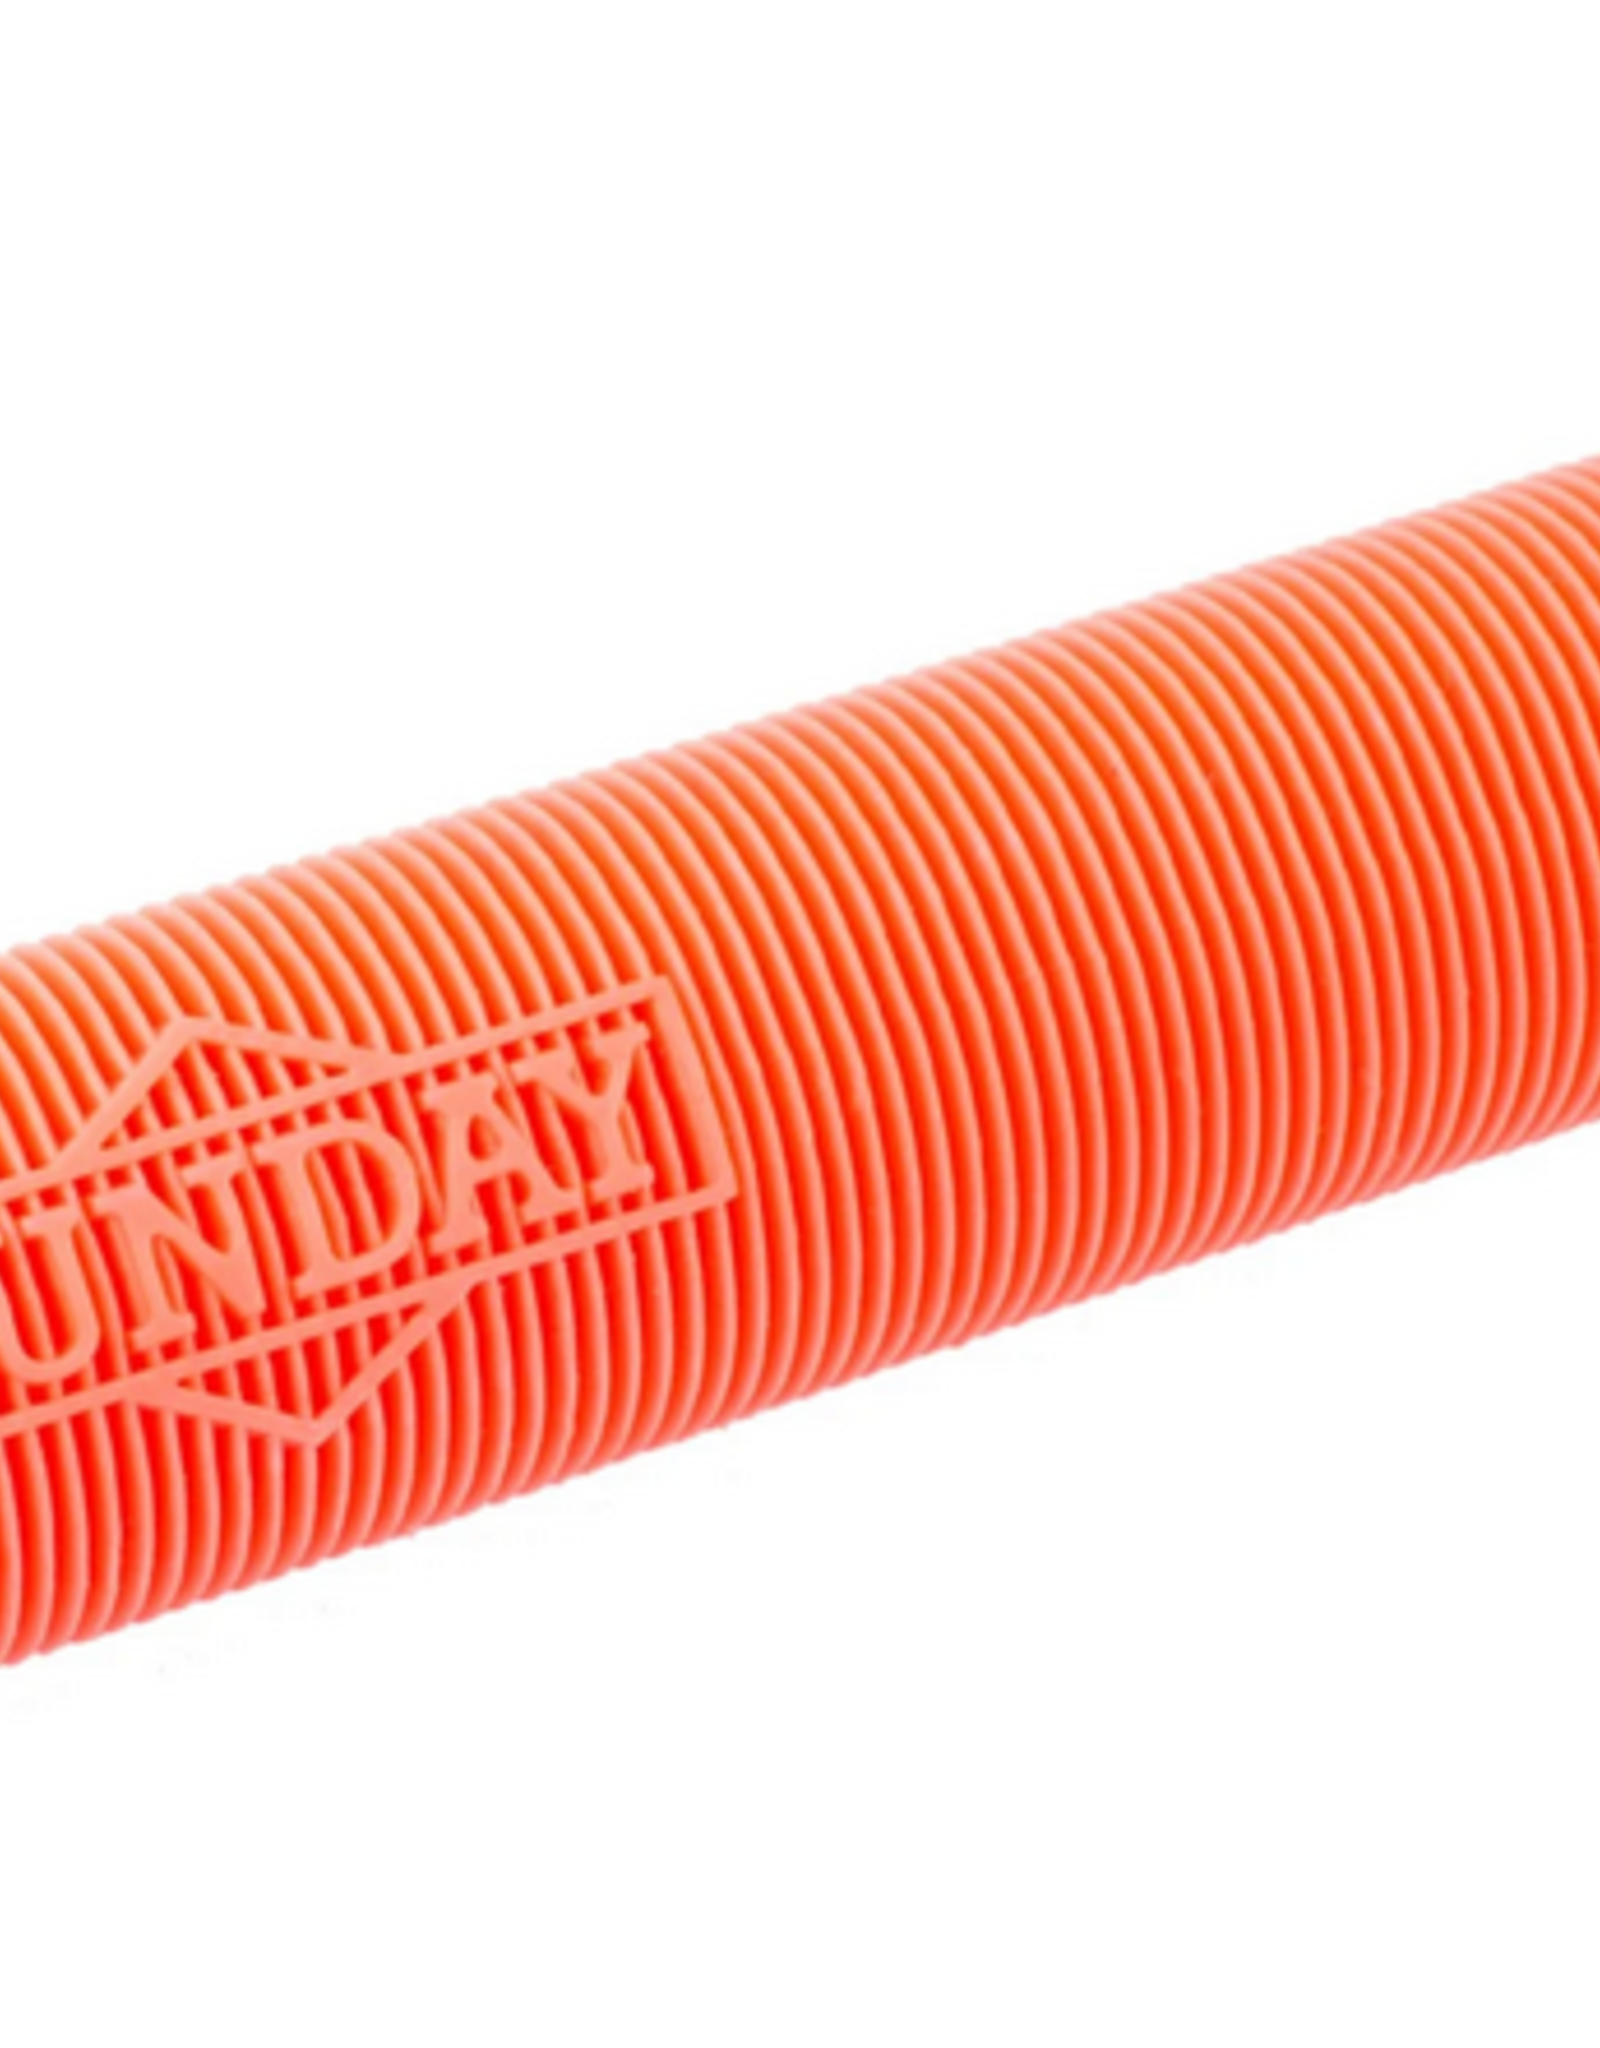 SUNDAY SUNDAY CORNERSTONE GRIPS BRIGHT RED